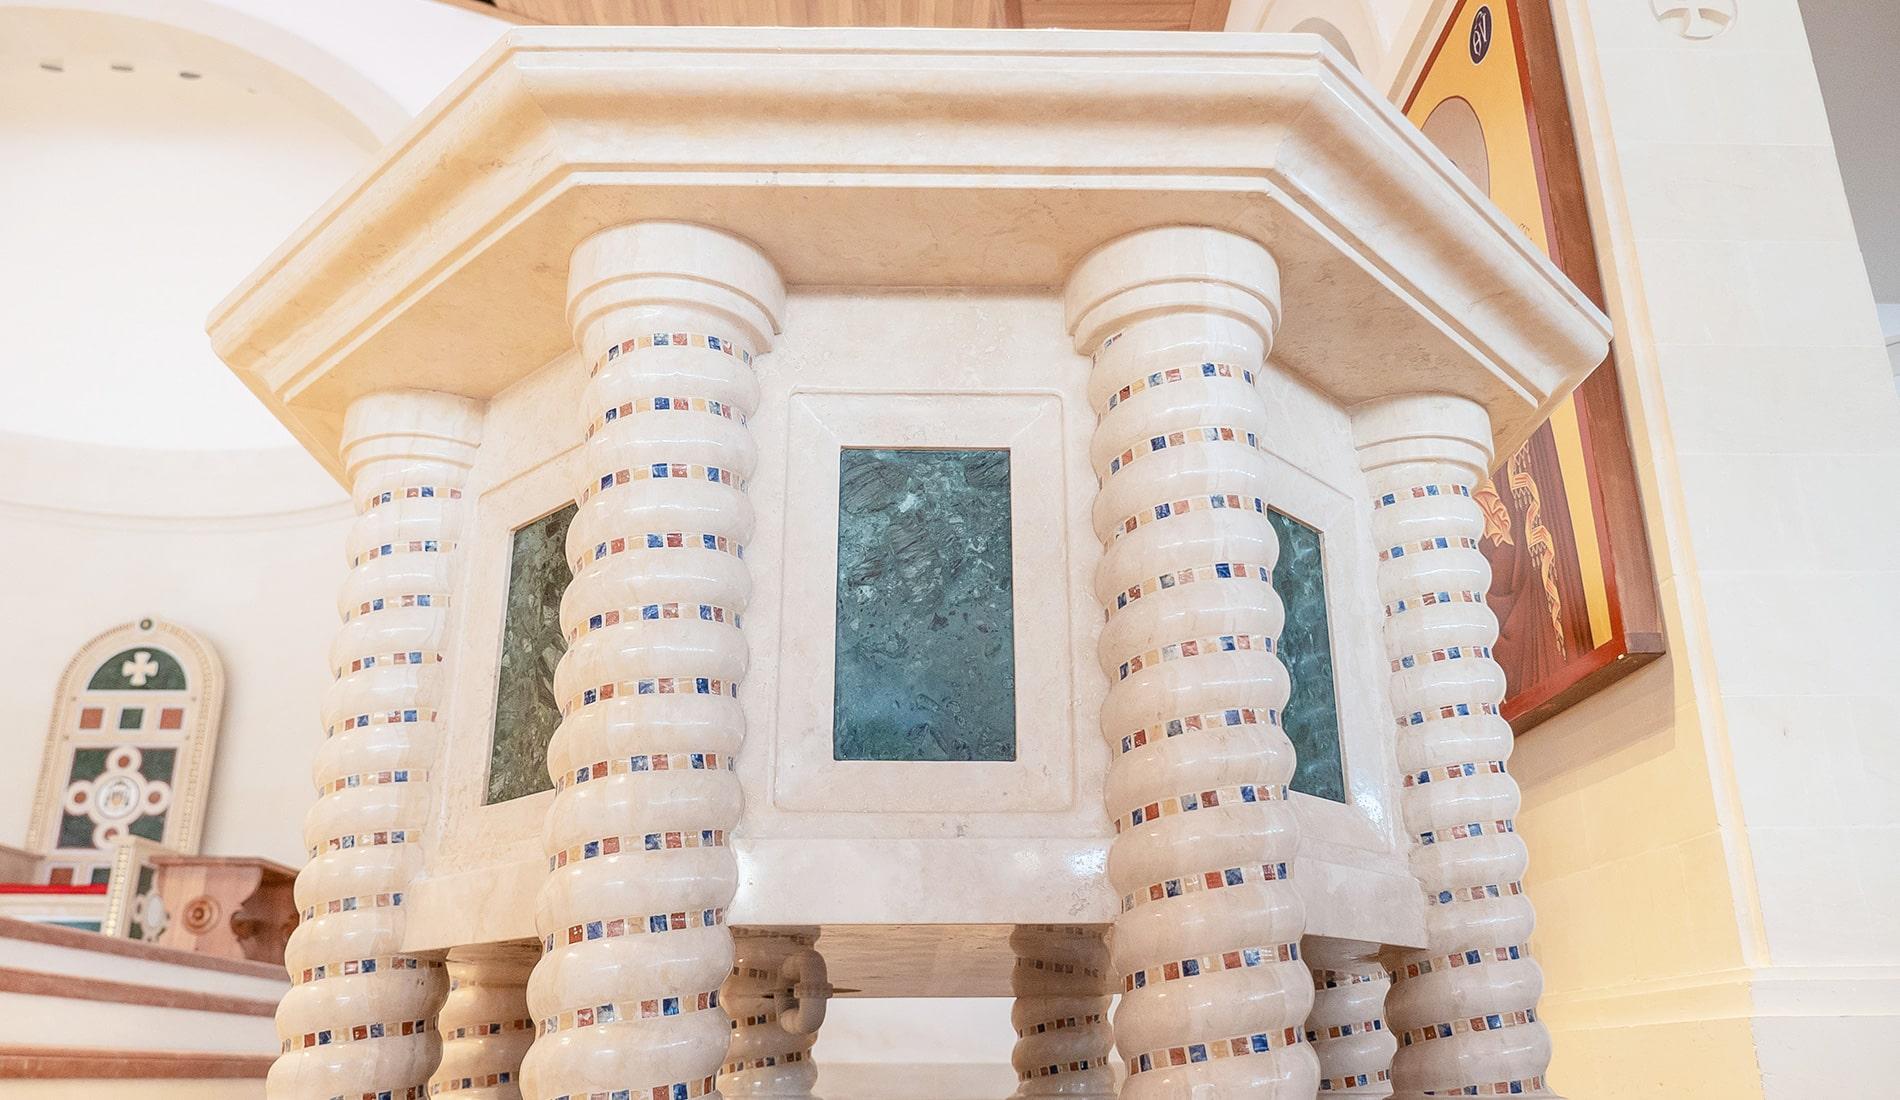 marmi-strada-villa-castelli-brindisi-marmi-graniti-mosaici-arte-sacra-architettura-chiese-5